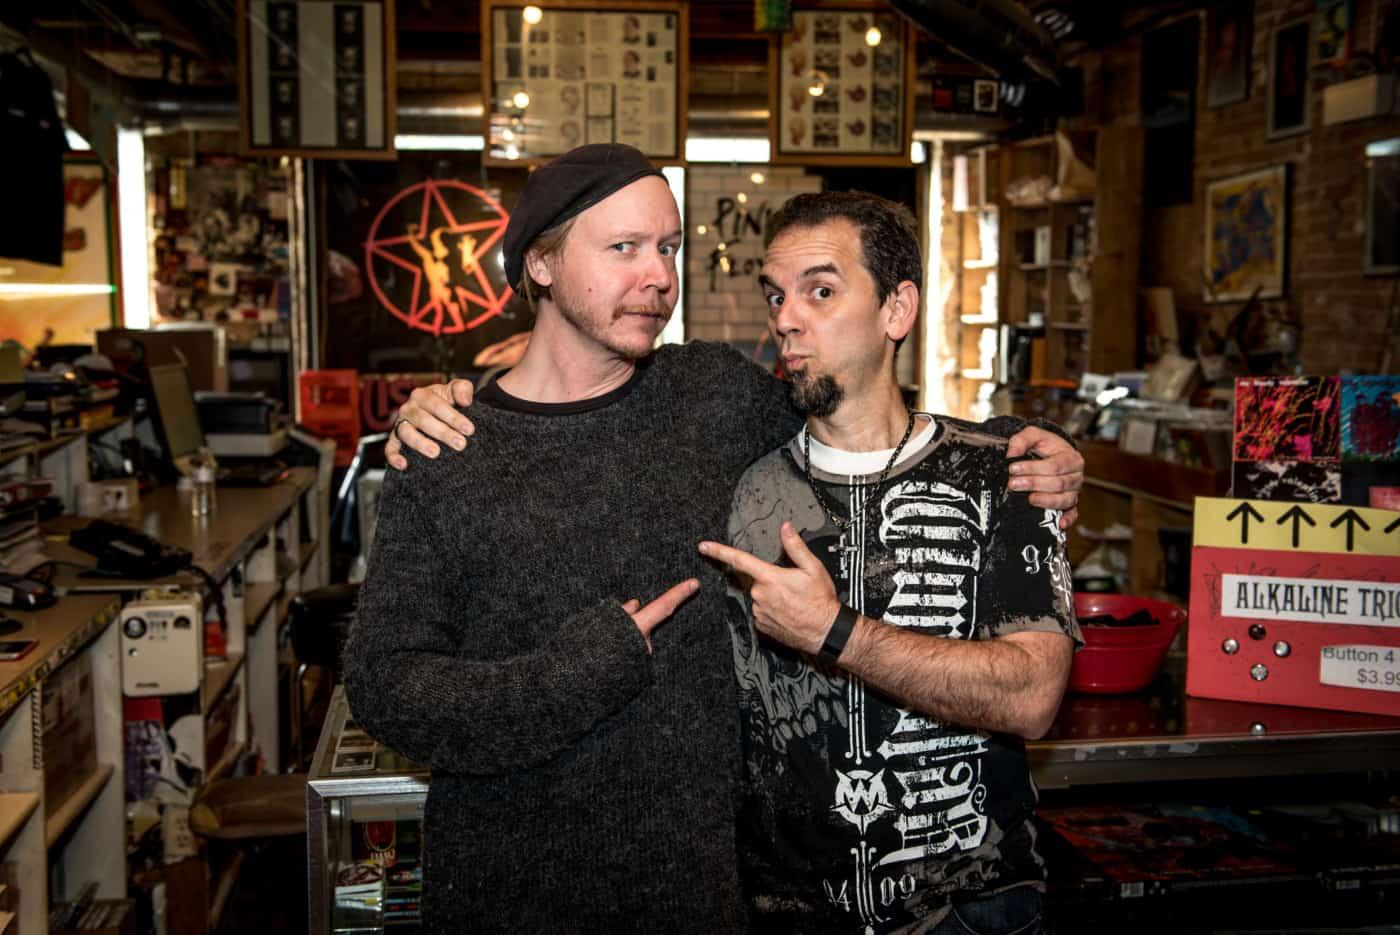 Joel Barrios and Necromonkey's drummer Mattias Olson